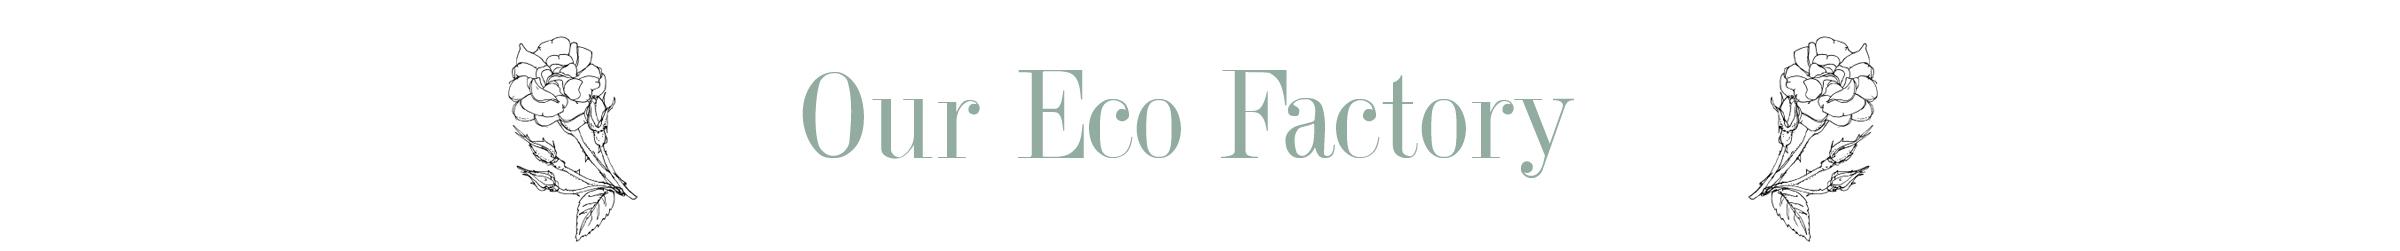 eco-factory.jpg